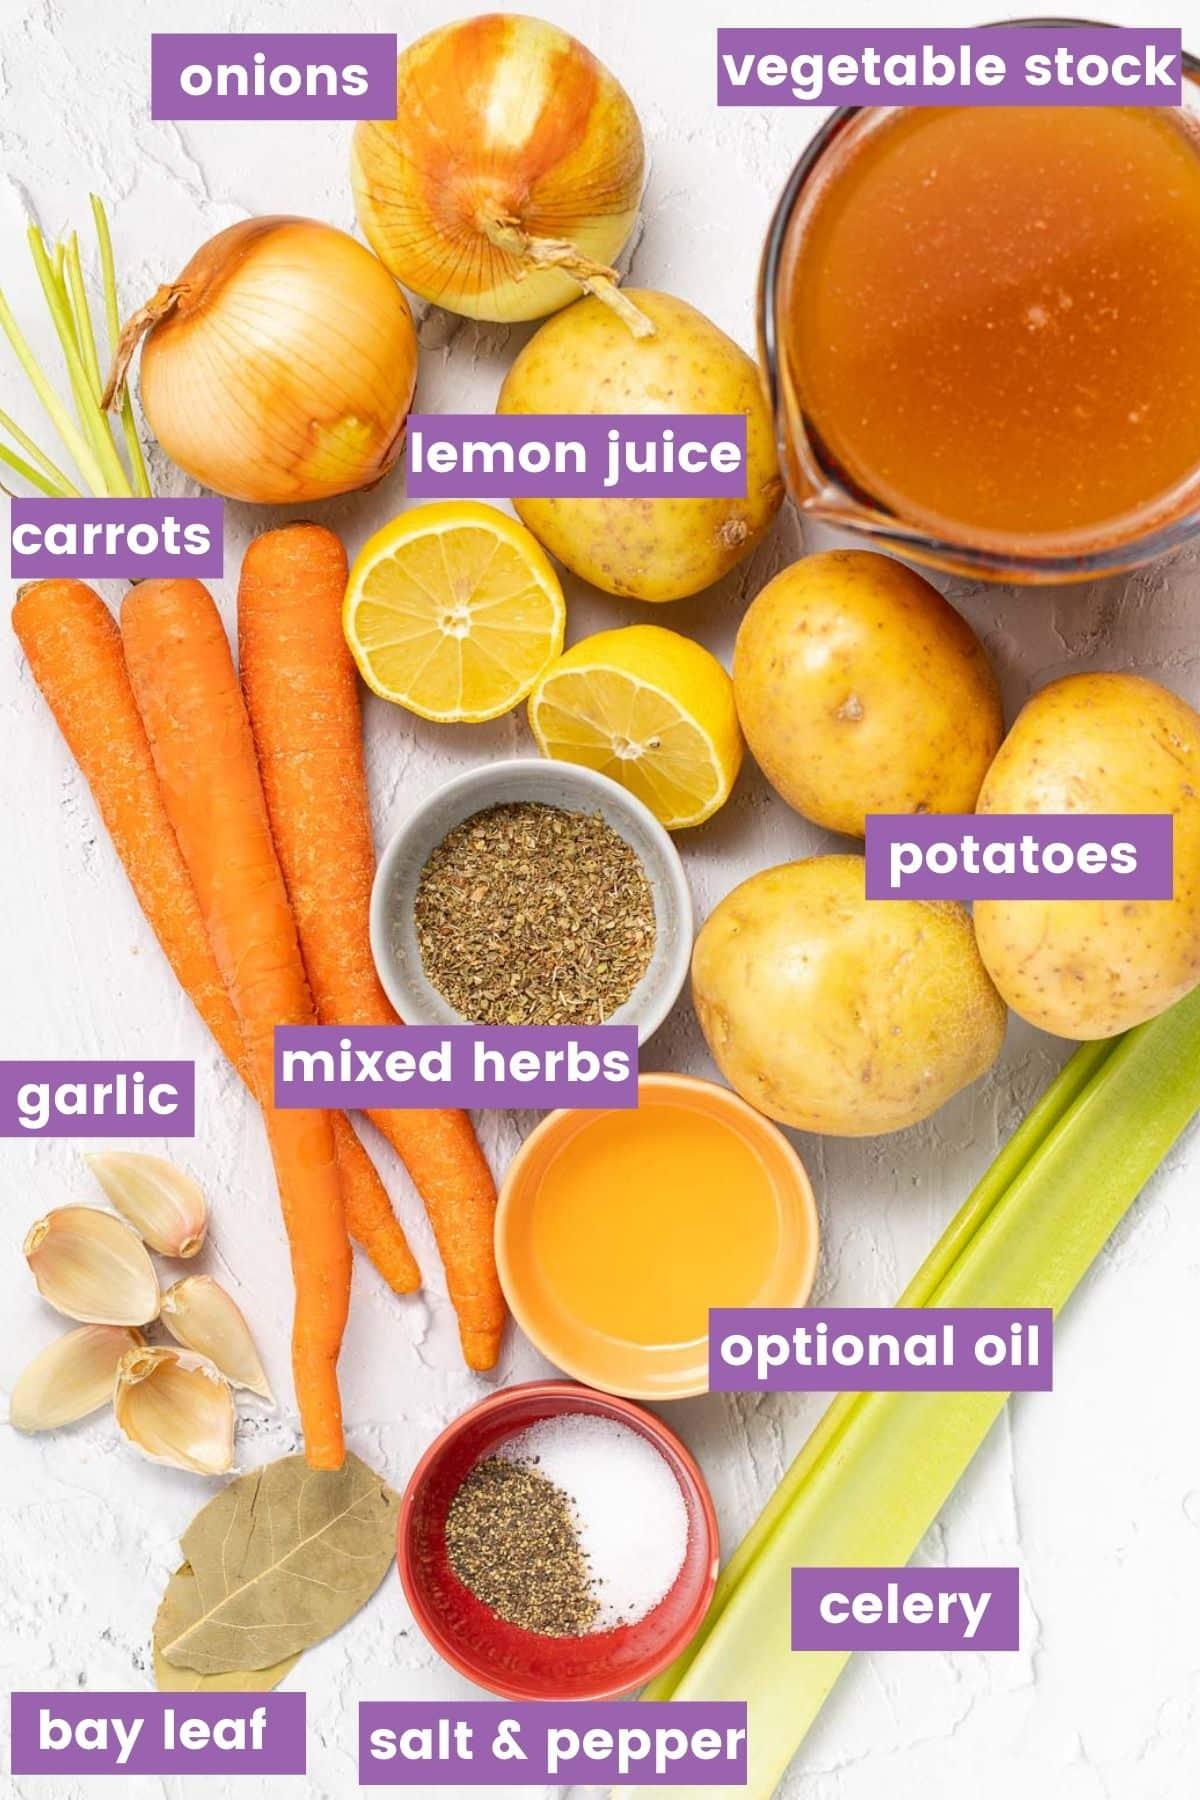 ingredients (as per the written recipe)